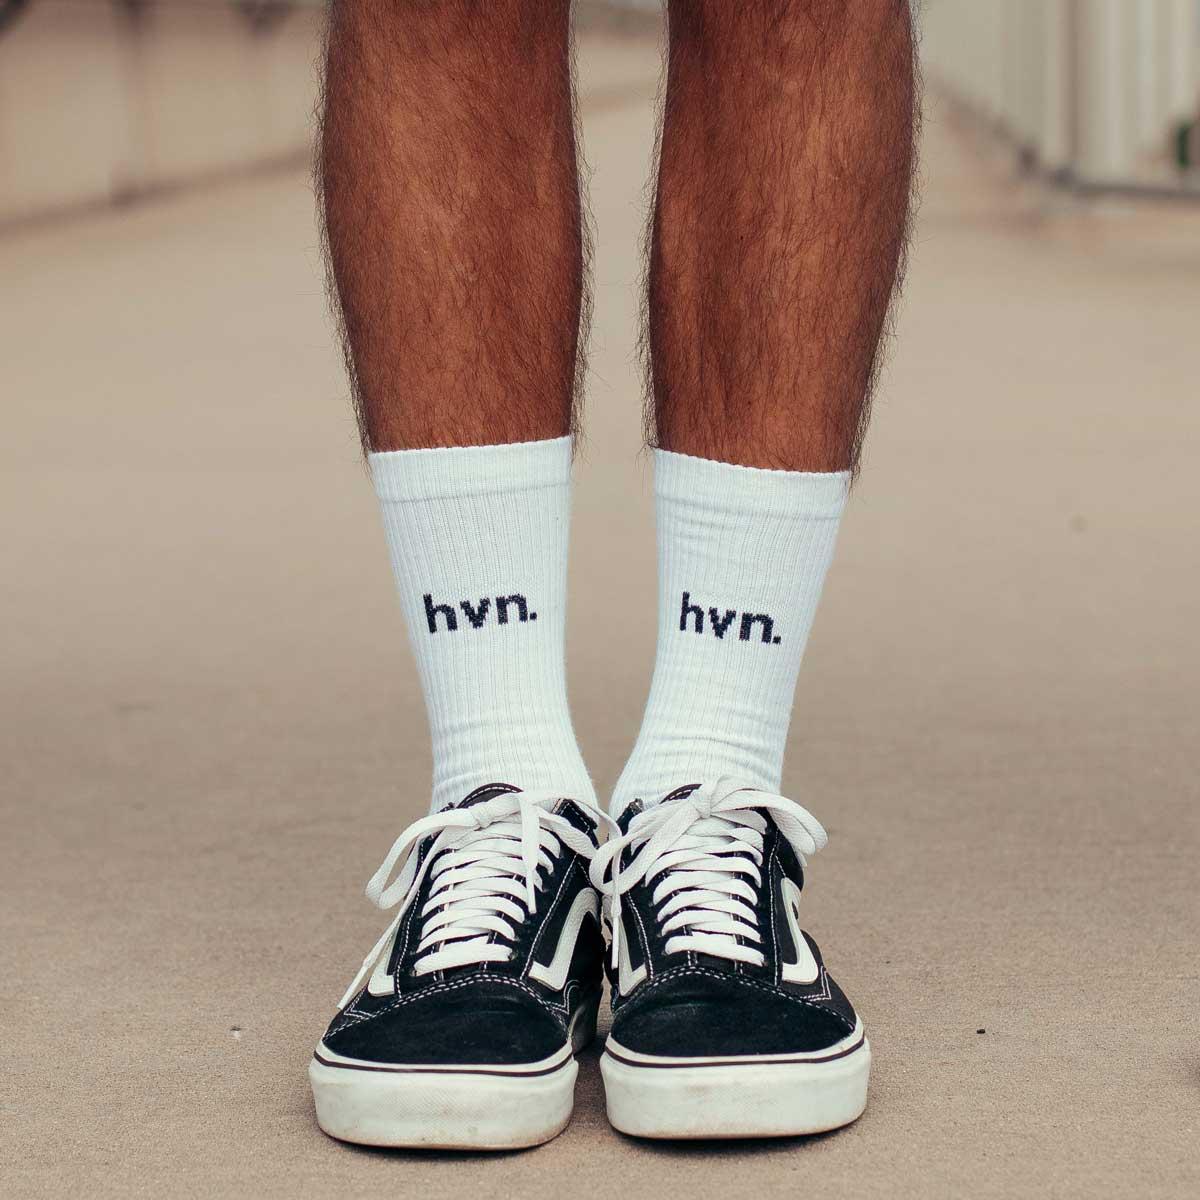 Good-Natured-Socken-HVN